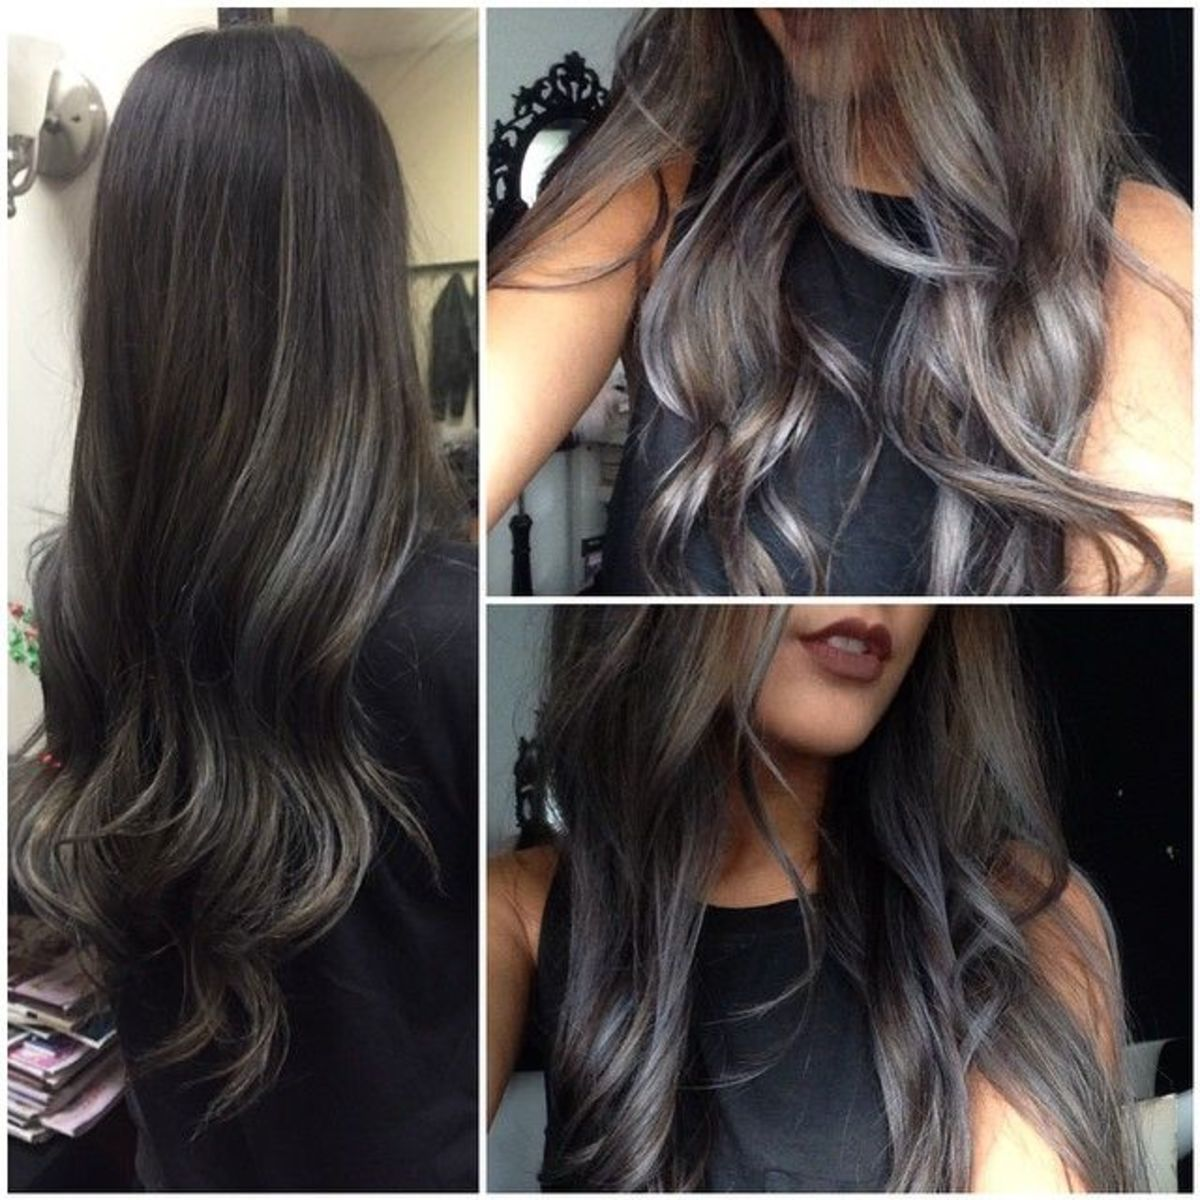 DIY Hair: 8 Ways to Rock Gray Hair | Bellatory